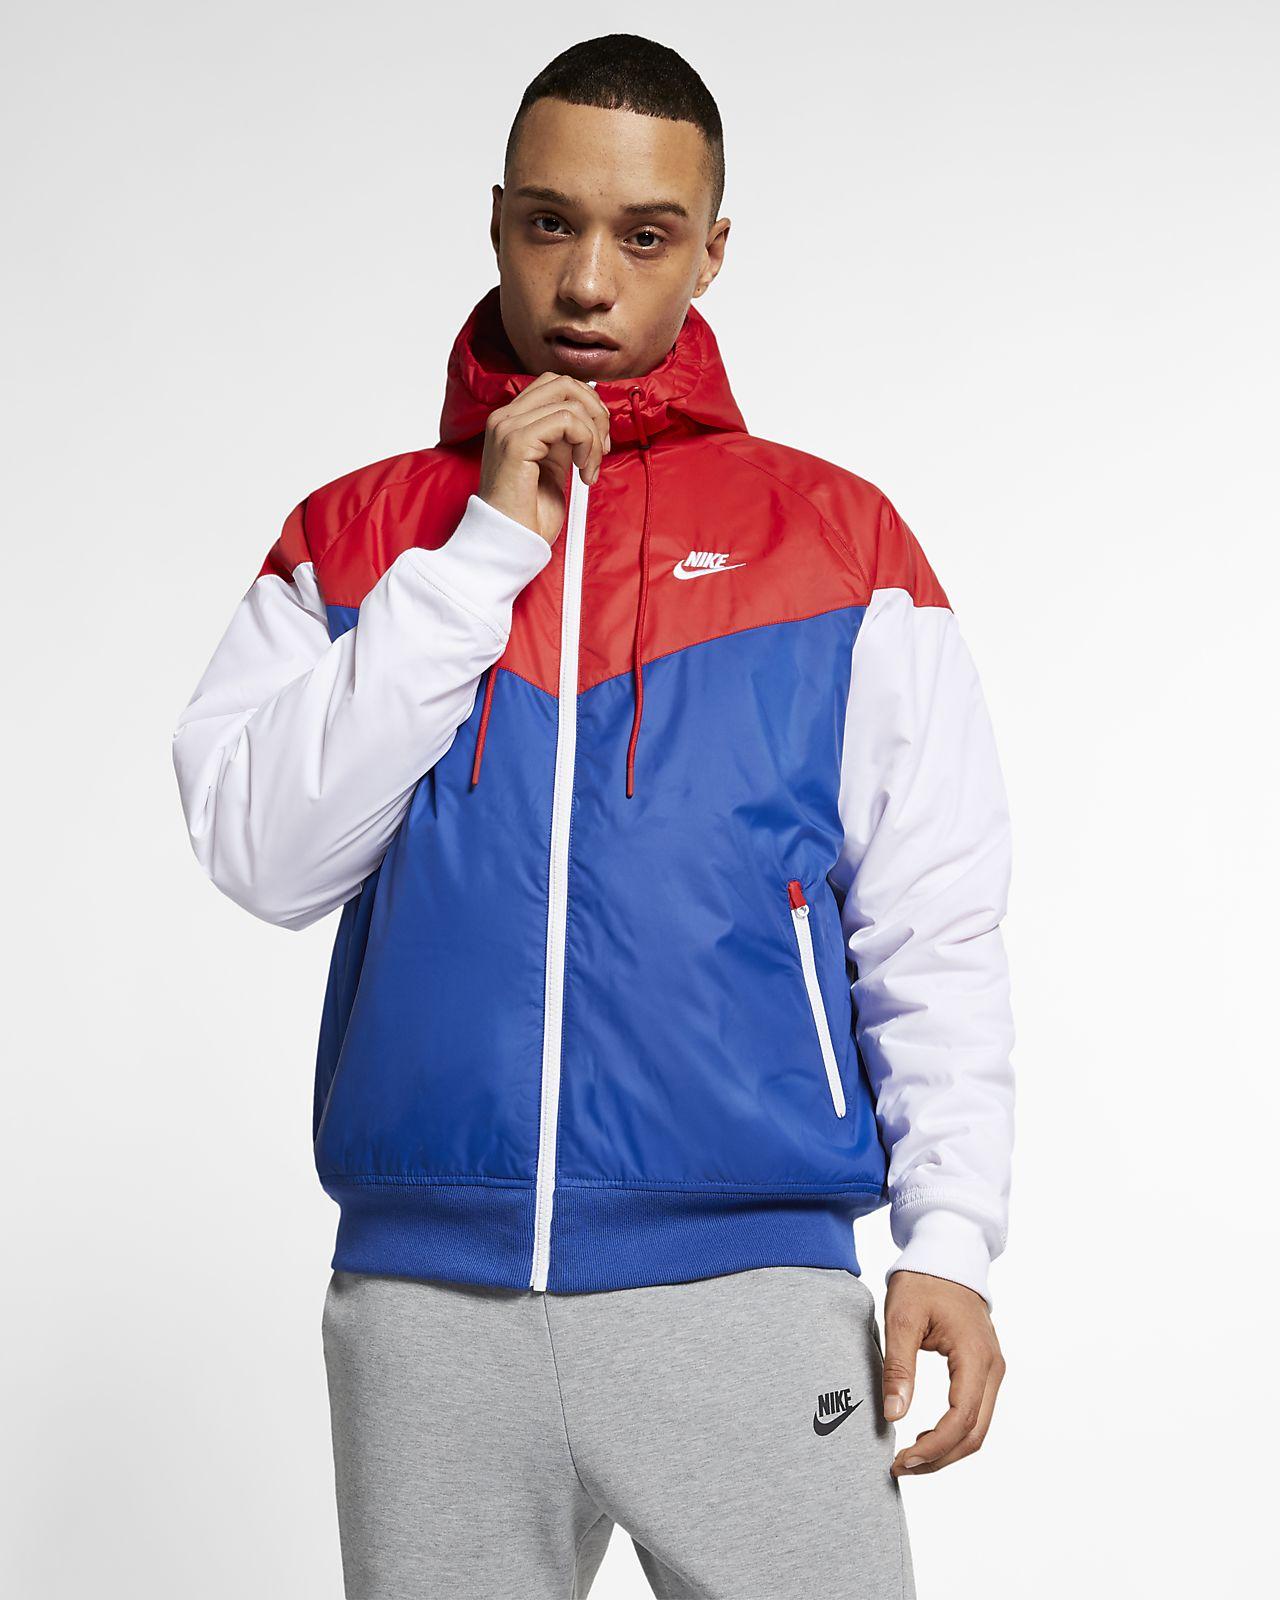 1a2e545bfd24 Nike Sportswear Windrunner Men s Hooded Jacket. Nike.com MA